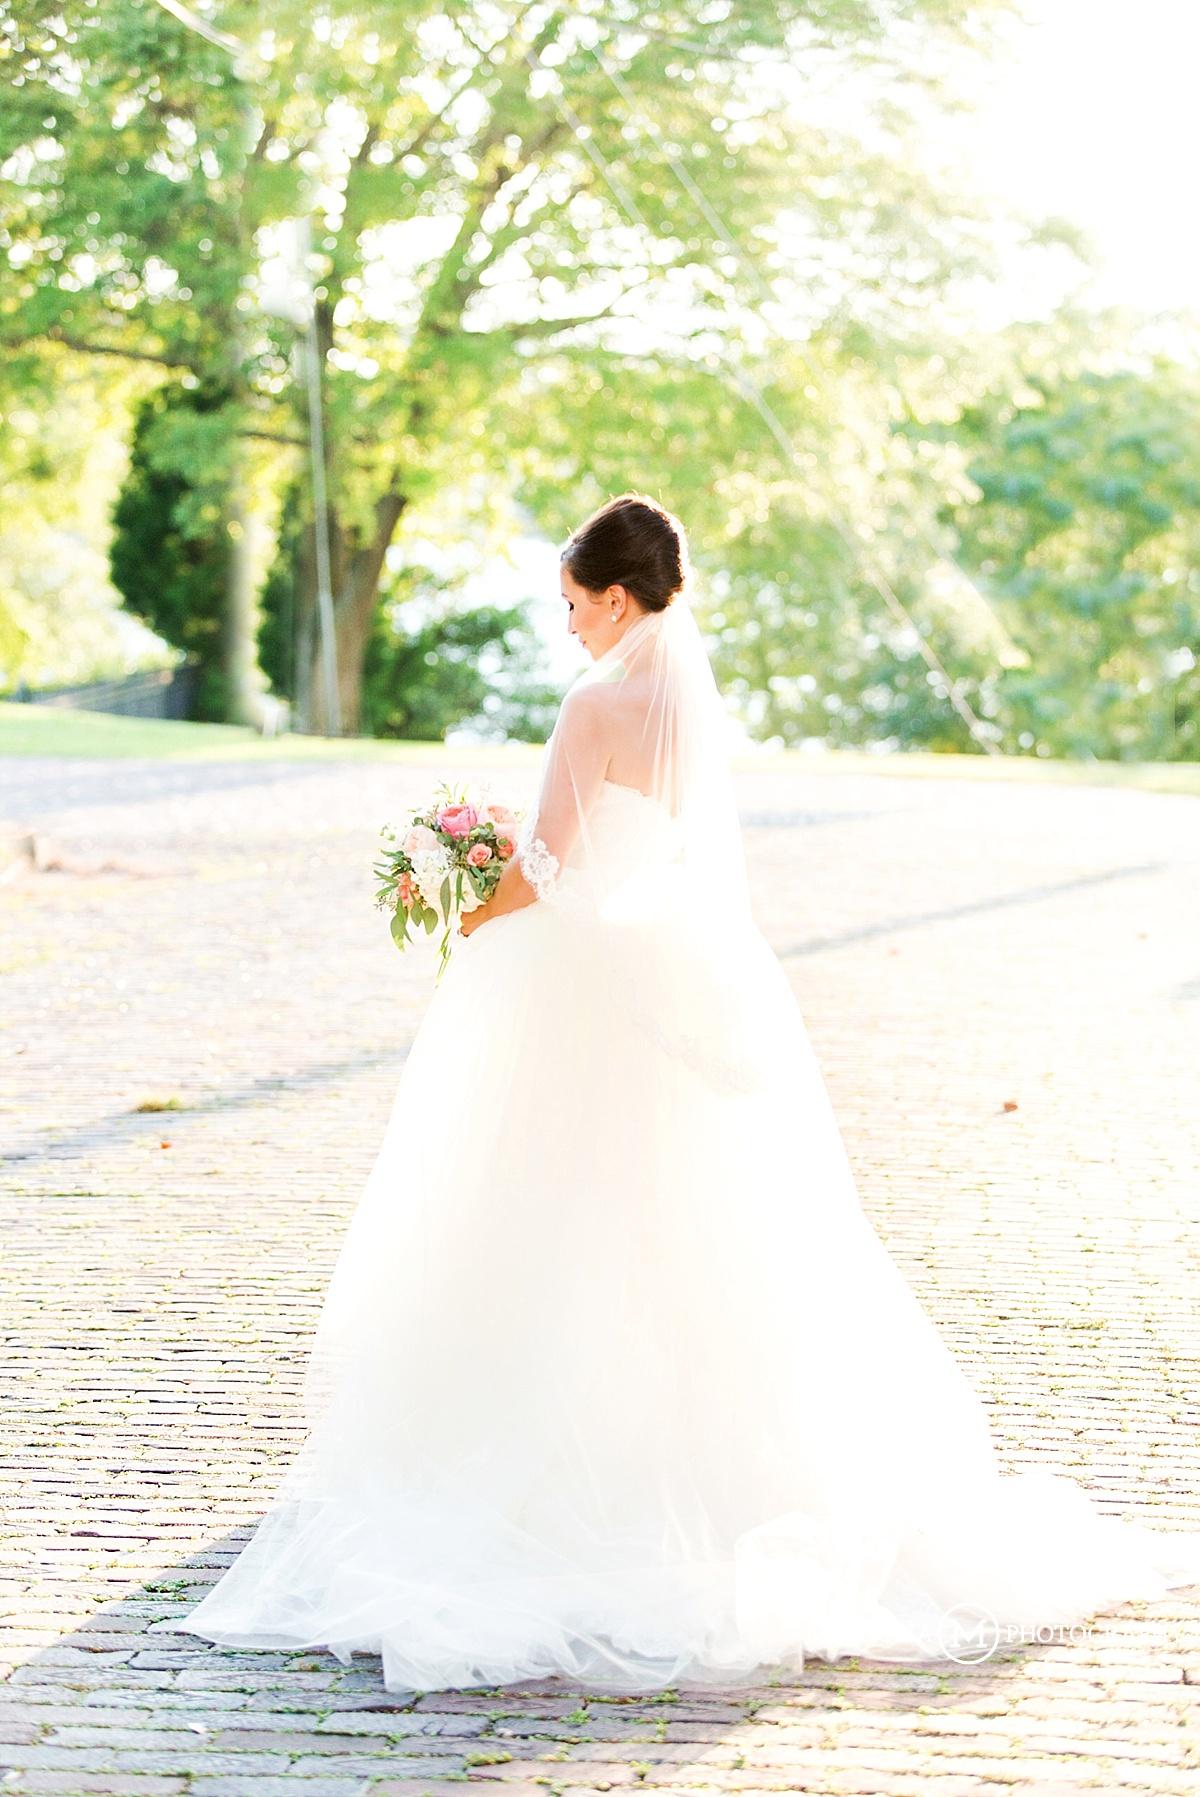 weddings at brooklyn arts center-58-1